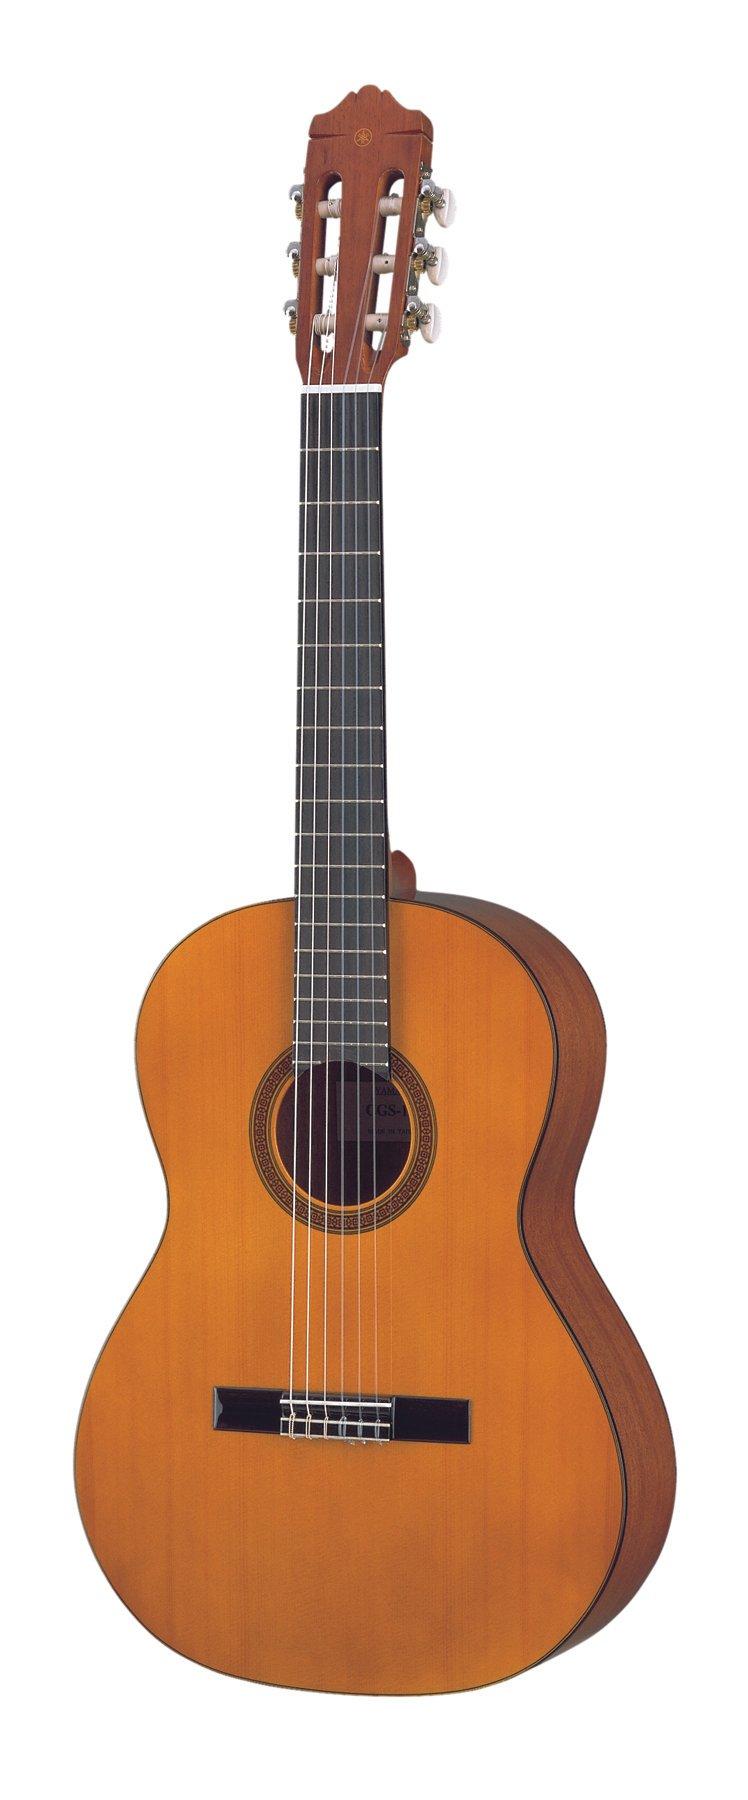 Yamaha CGS103A 3/4 Size Classical Guitar by Yamaha